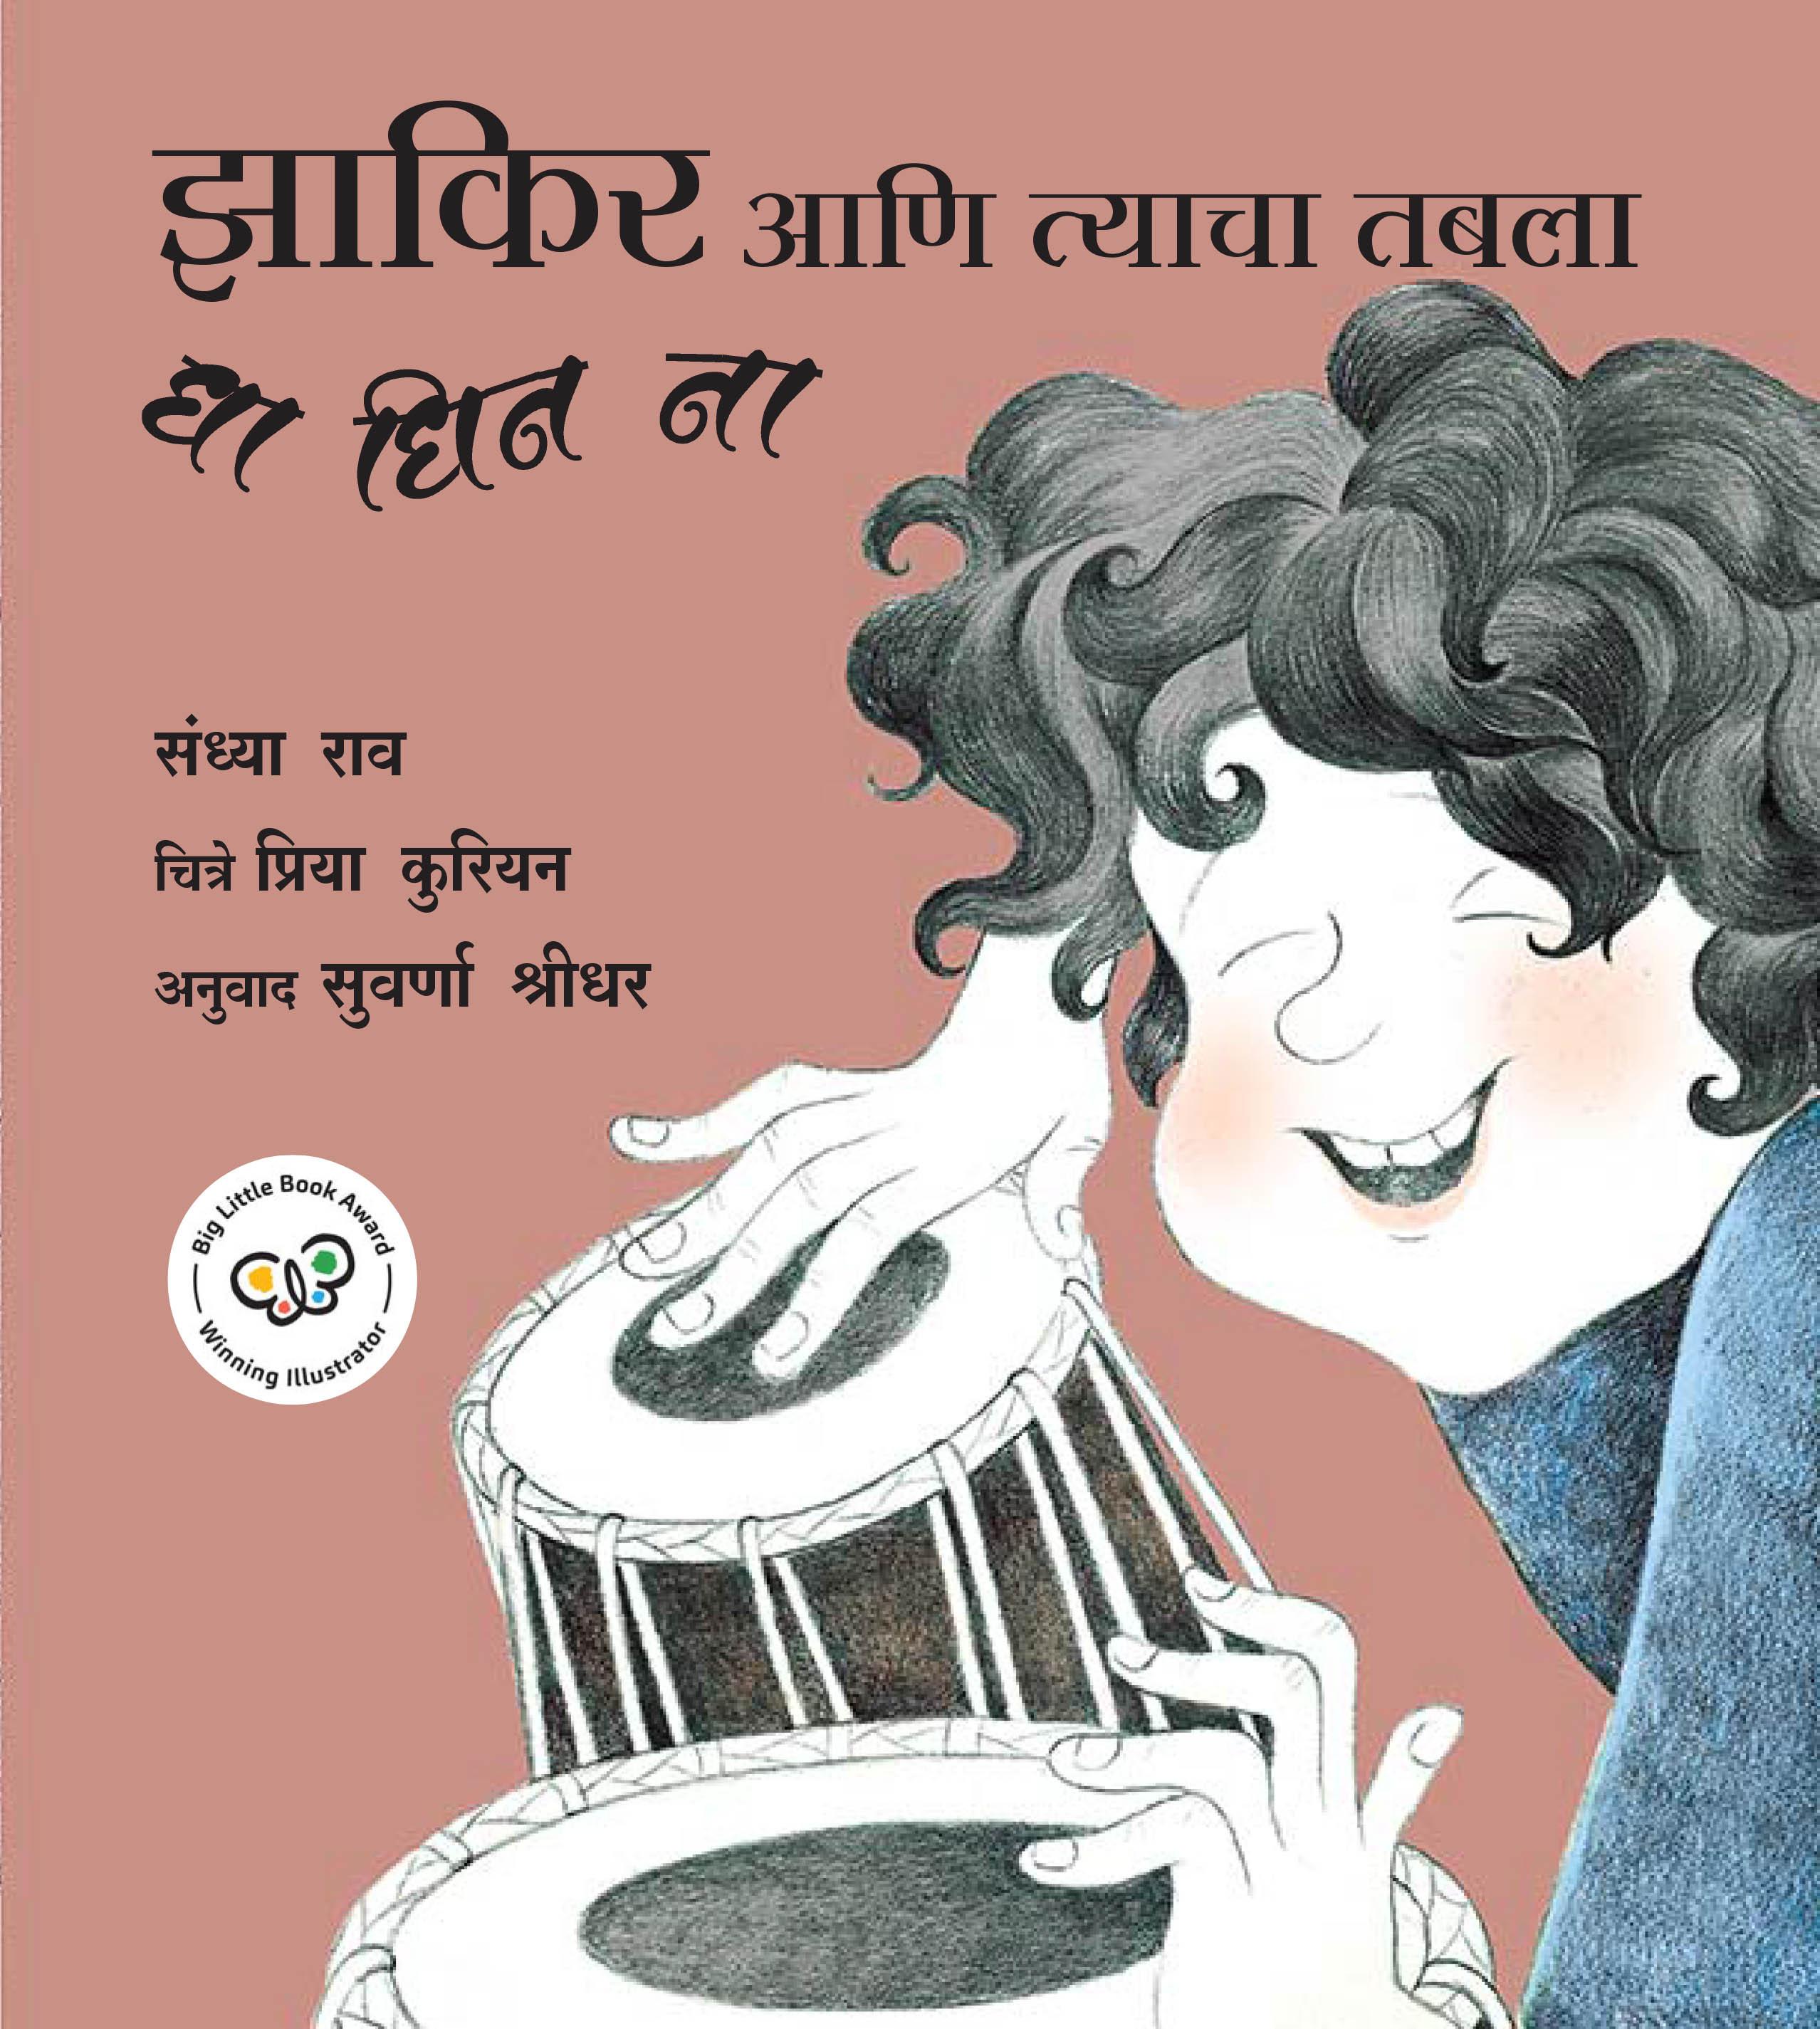 Zakir And His Tabla – Dha Dhin Na/Zakir Ani Thyacha Tabla – Dha Dhin Na  (Marathi)